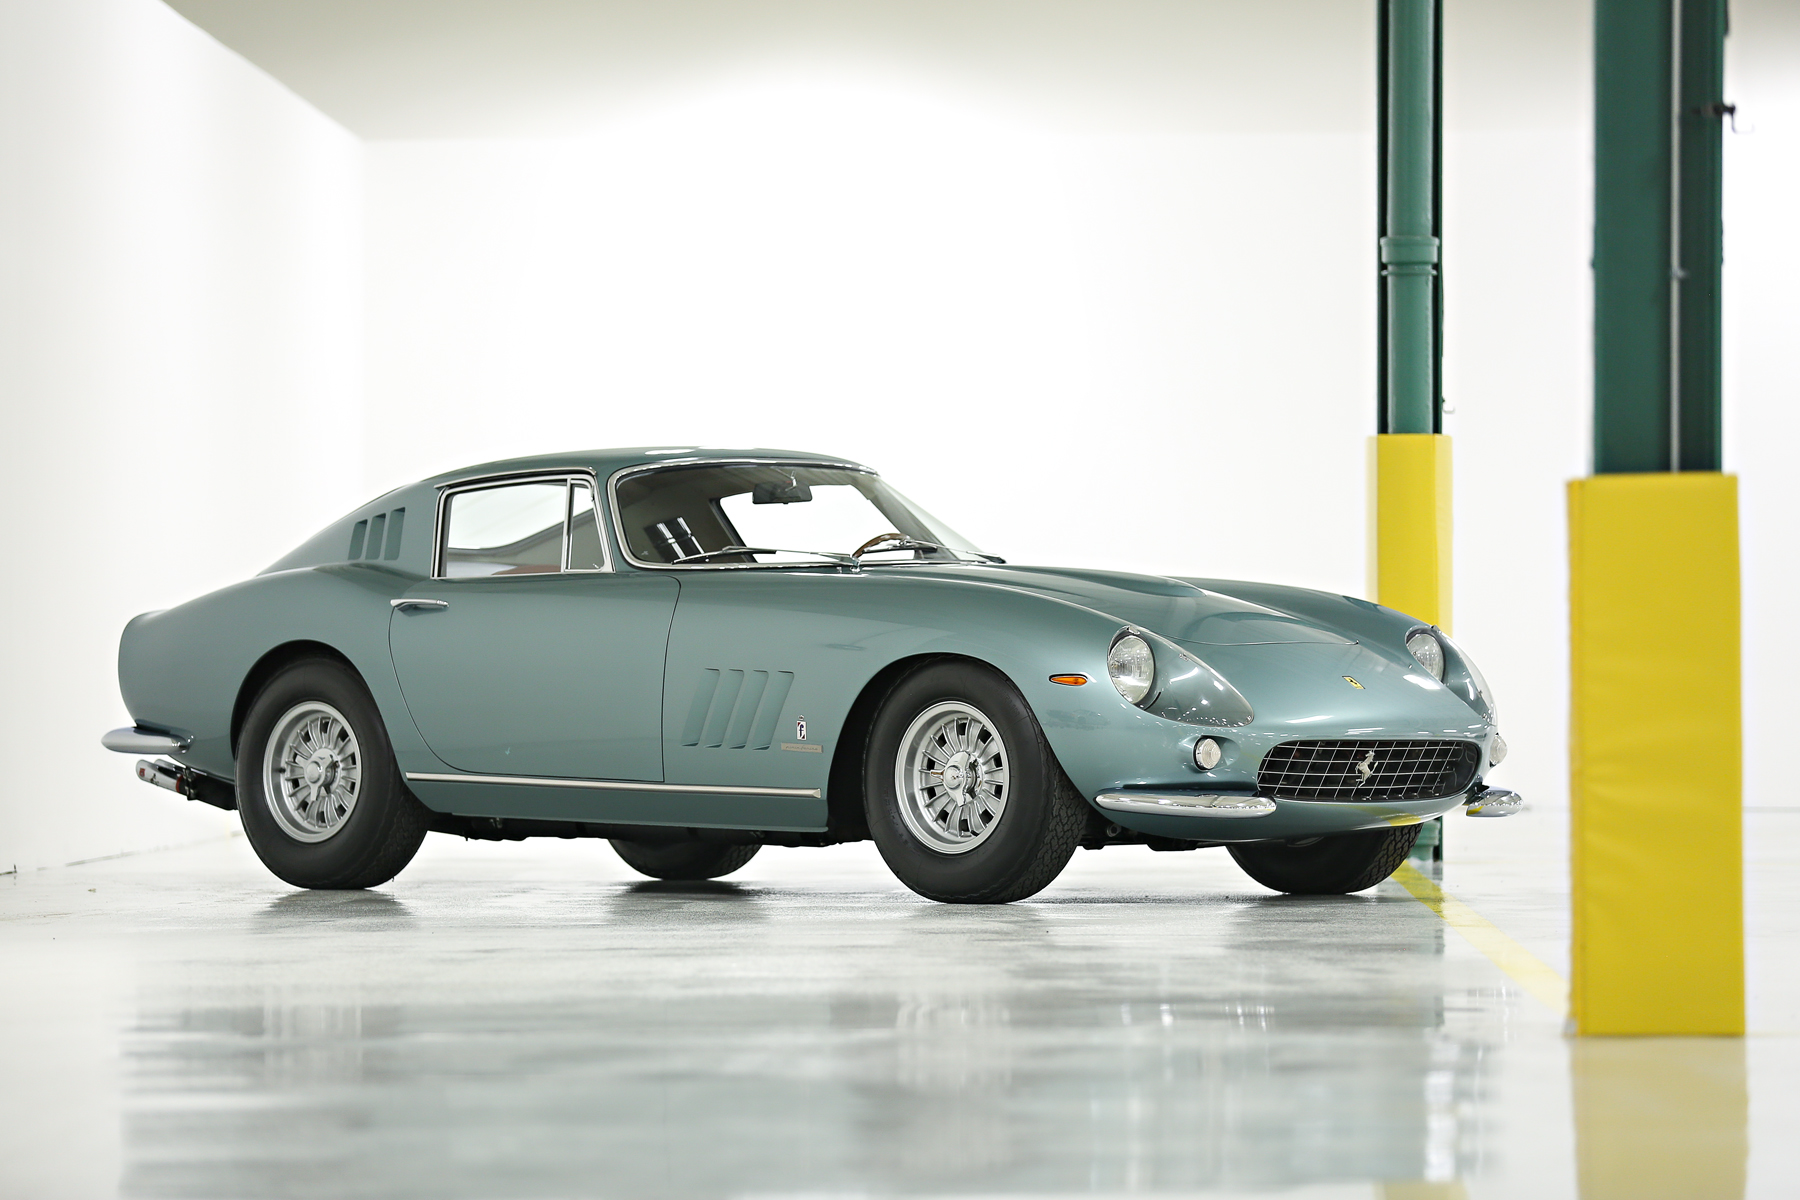 ClassicCars.com Reports: European classics flounder at AZ Auction Week